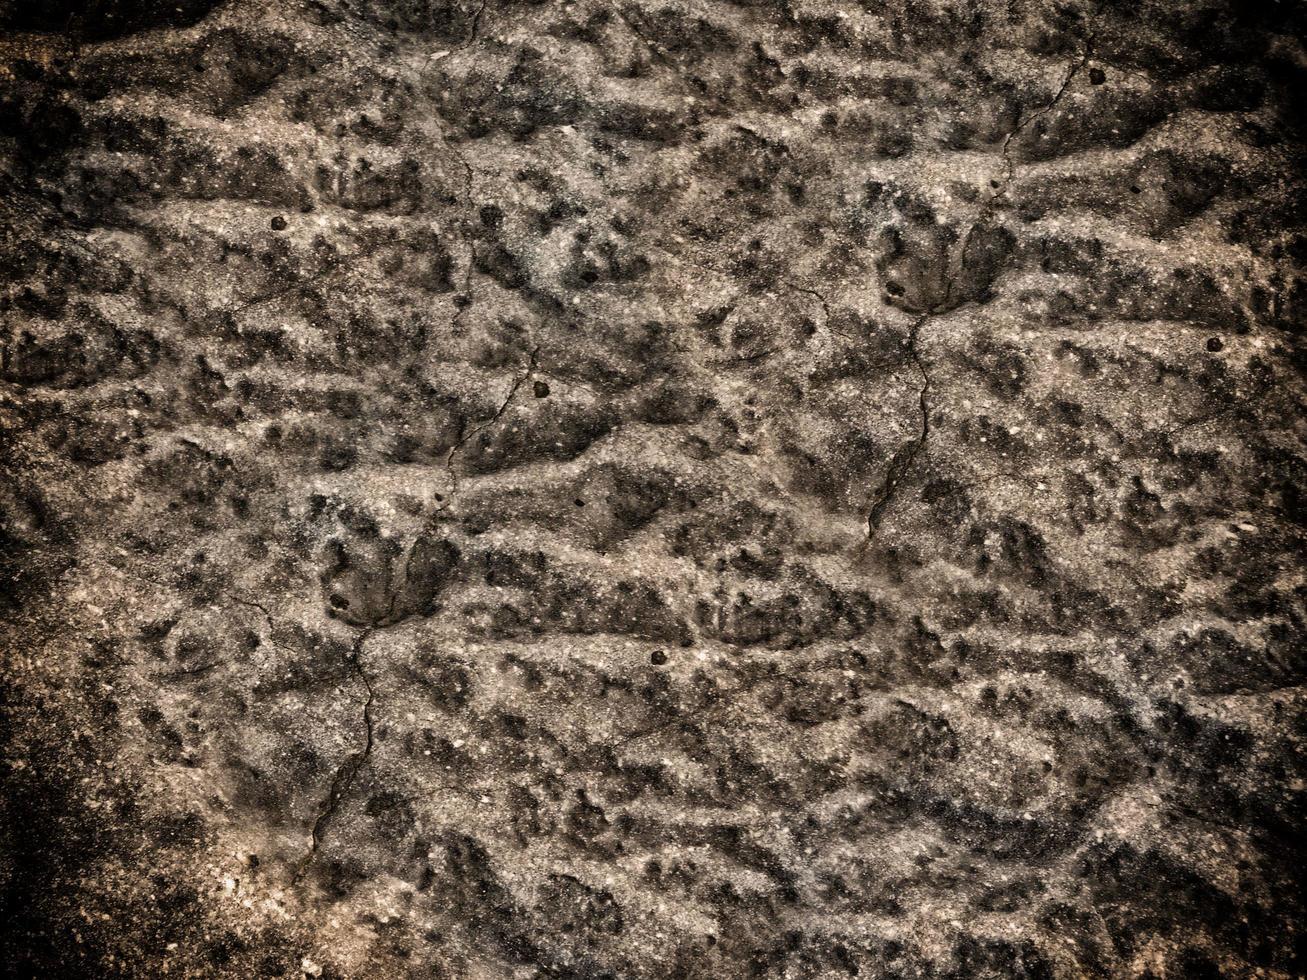 Marmor Textur im Freien foto